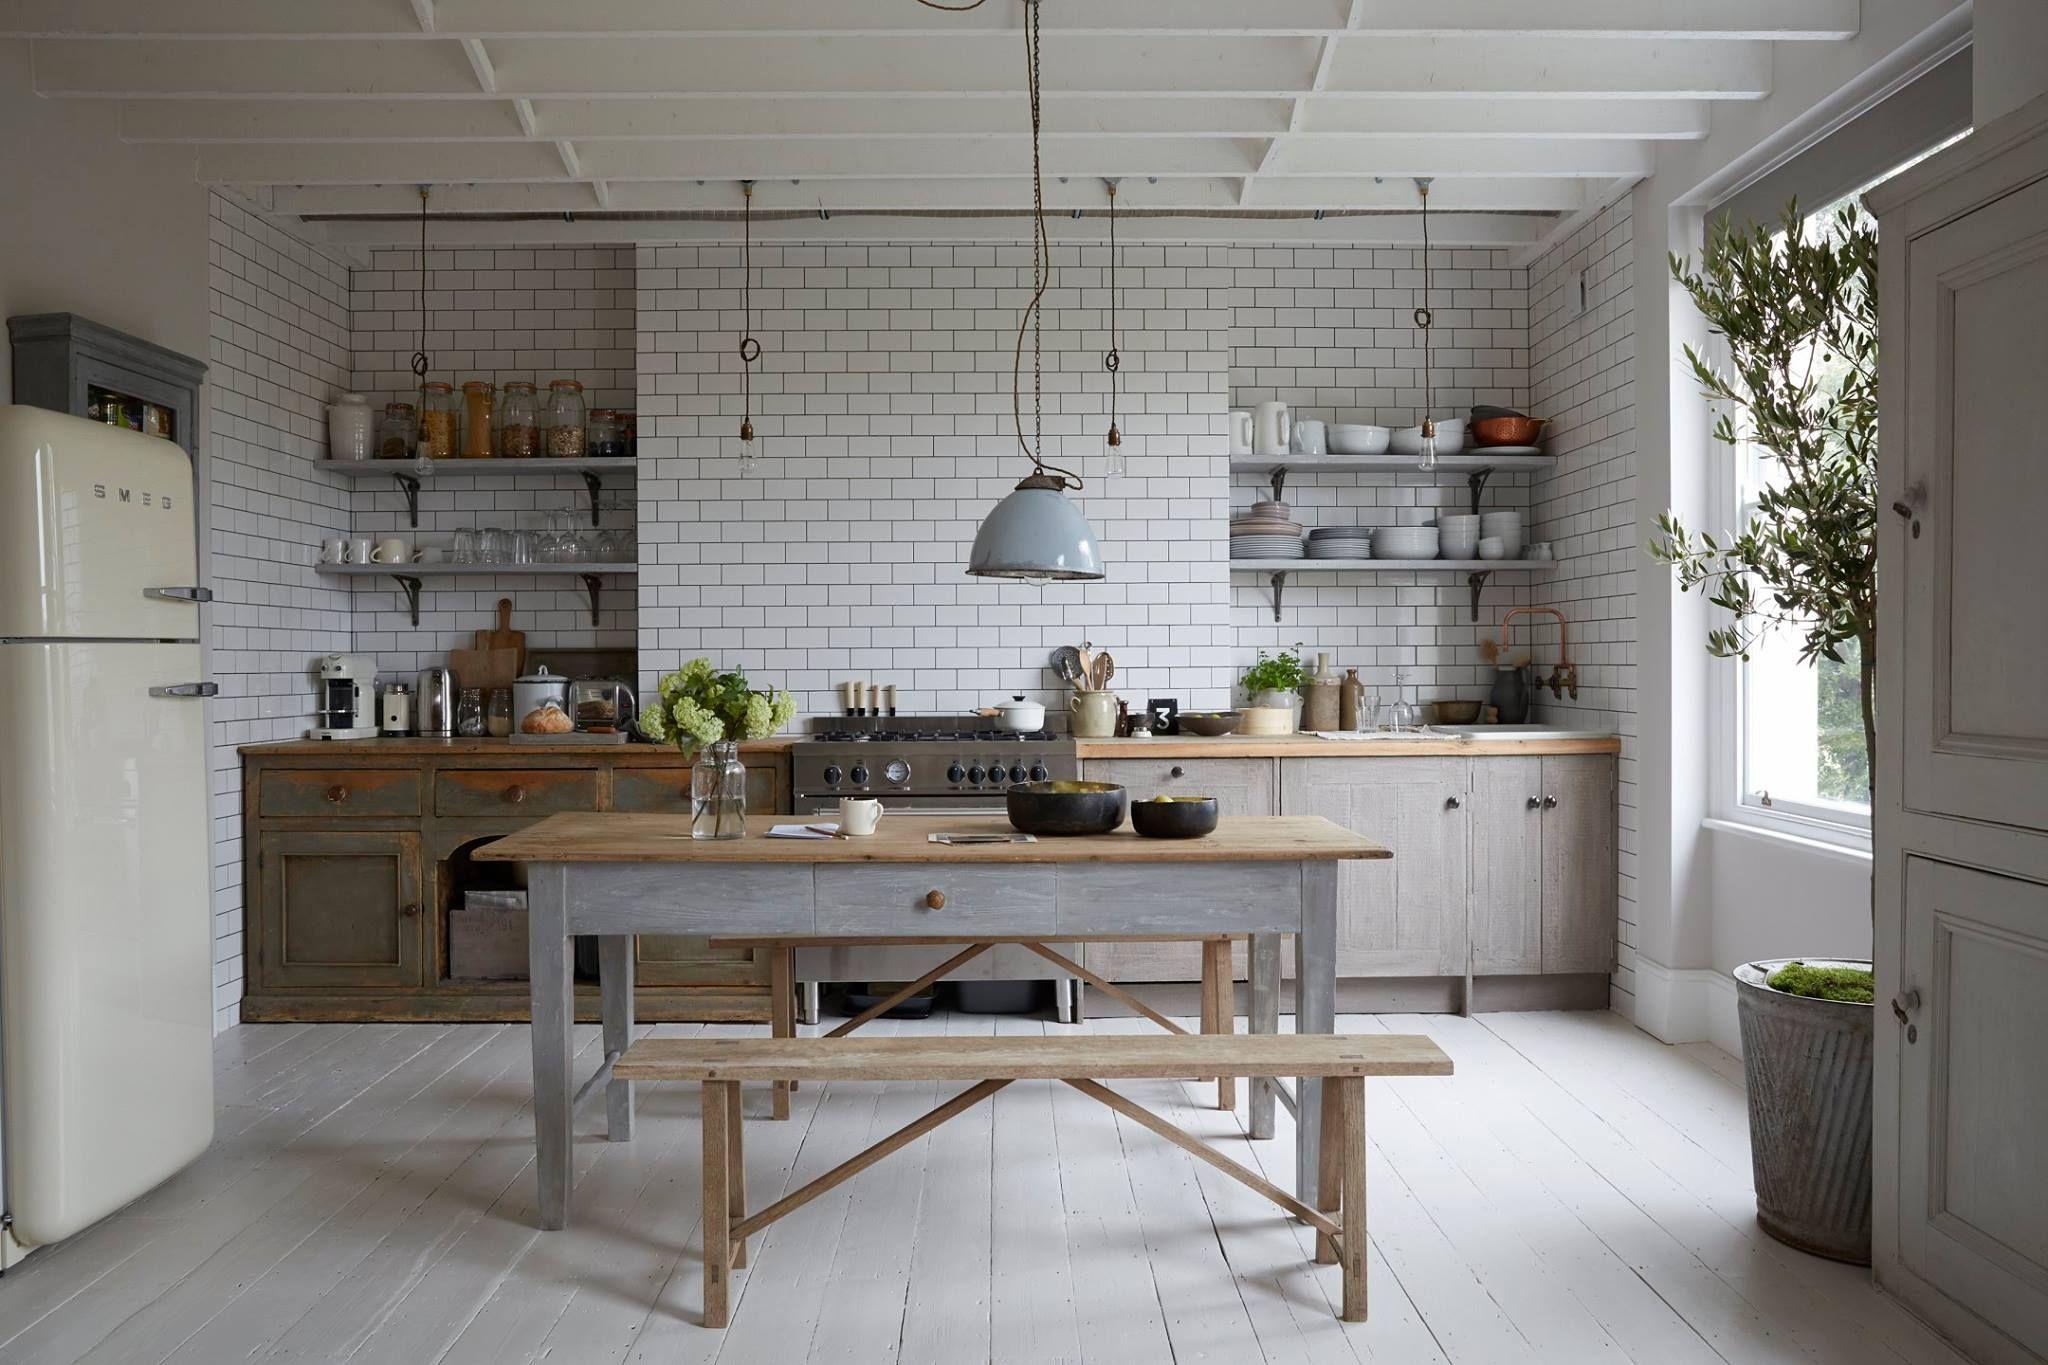 Pin by deborah mcghie on kitchens pinterest kitchens